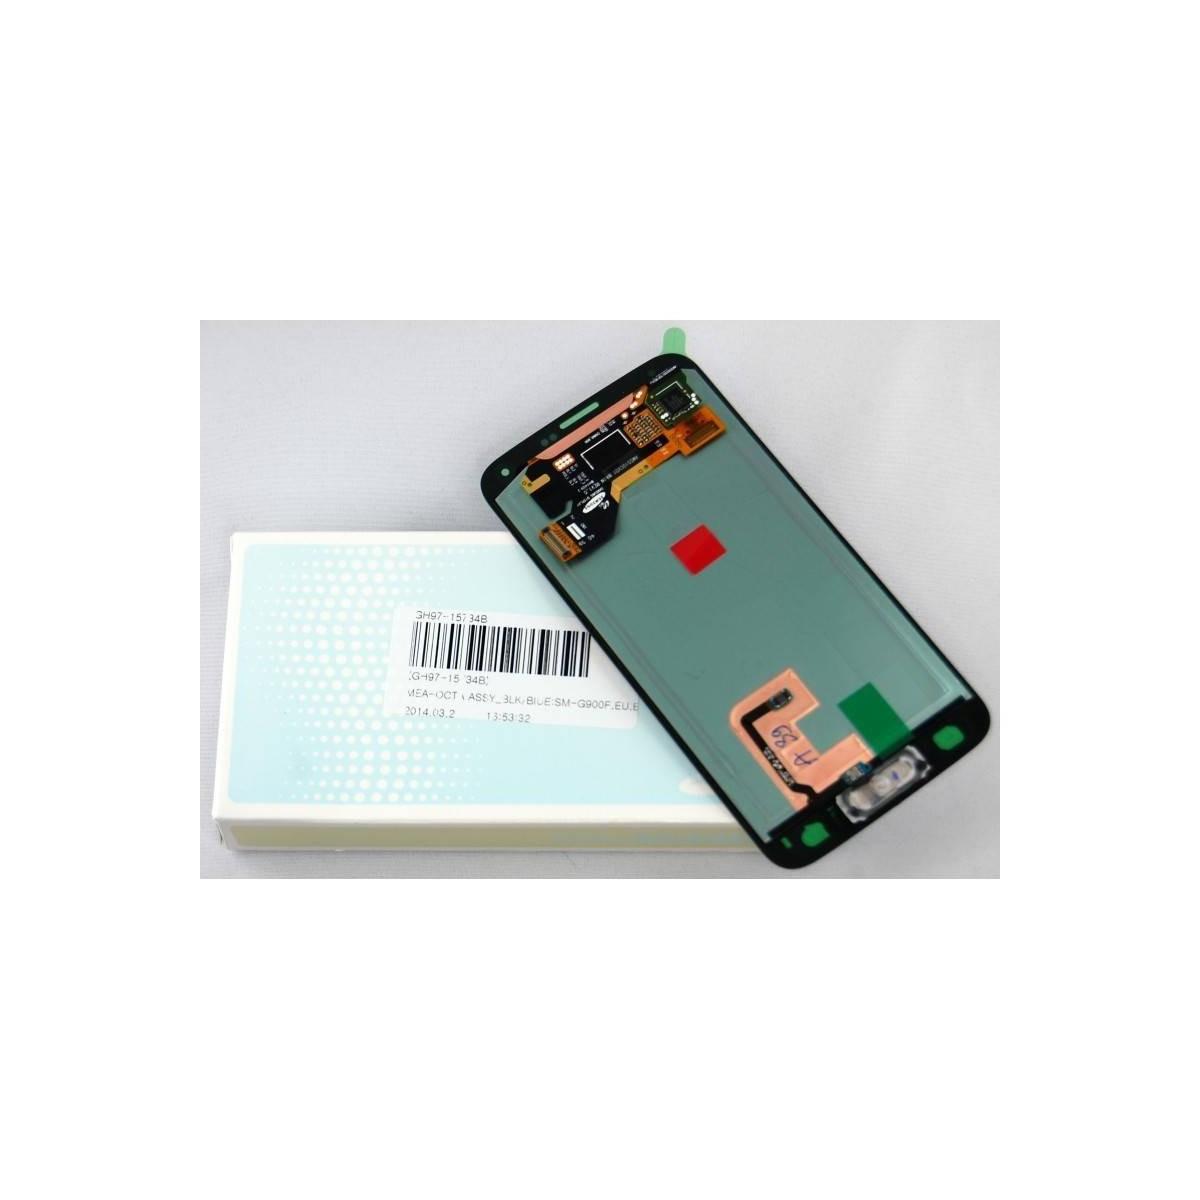 PANTALLA SAMSUNG GALAXY S4 I9600 NEGRA